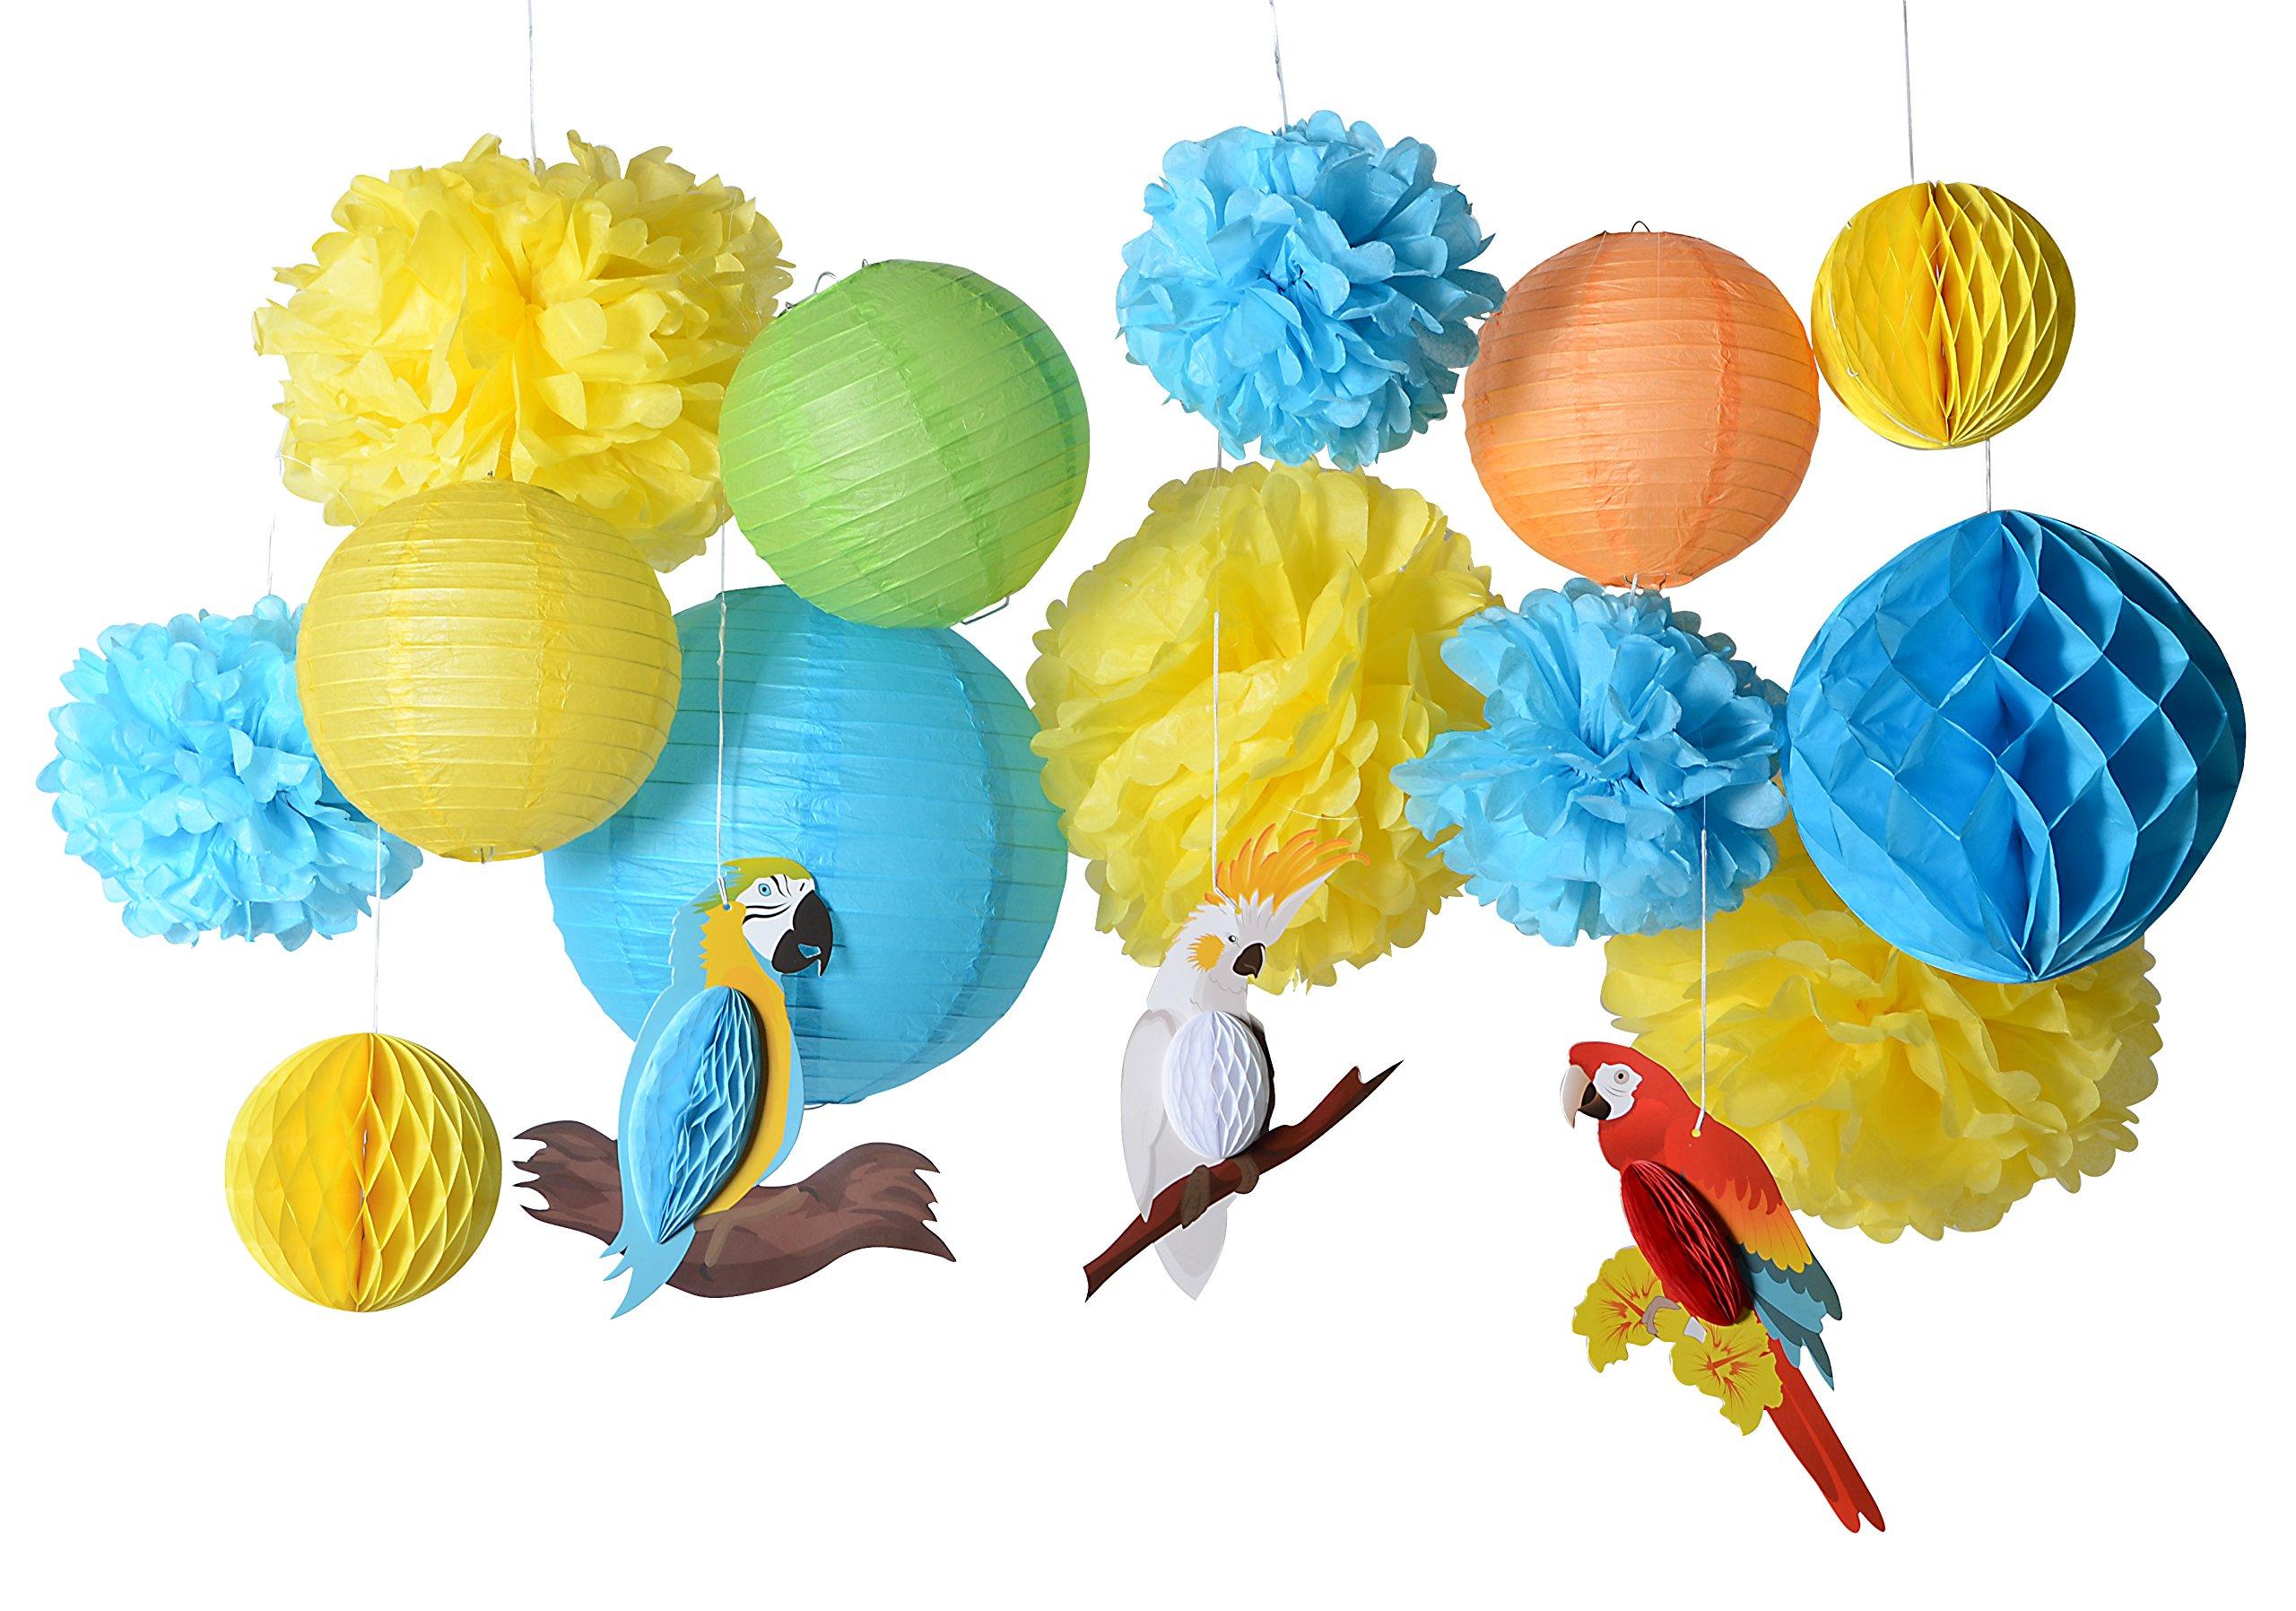 PAPER JAZZ 16pcs Parrot tropical birds Honeycomb Paper Pom Poms Lanterns for Wedding Birthday Summer Beach Seaside Hawaiian luan tiki Party Decorations Yellow Blue Green Color (parrot kit)